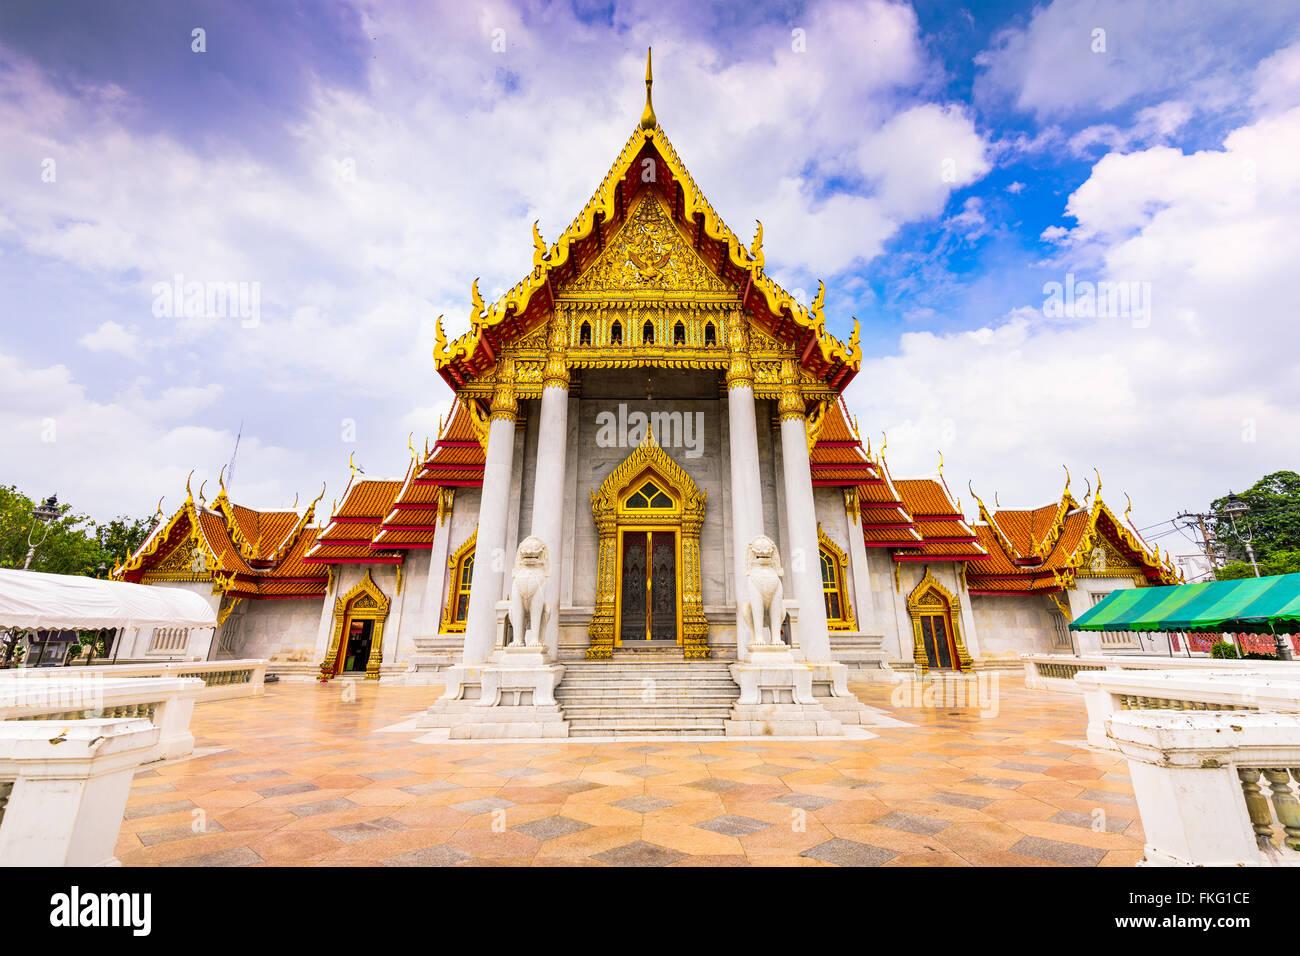 Bangkok, Thaïlande au Temple de marbre. Photo Stock